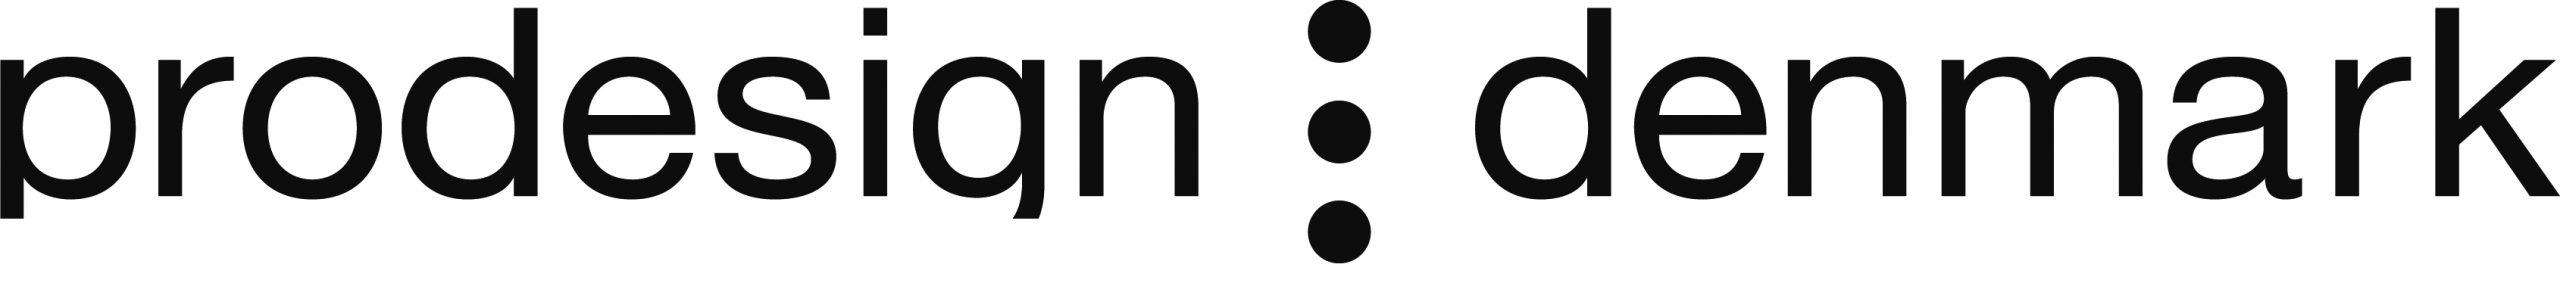 prodesign Logo_blacPD k